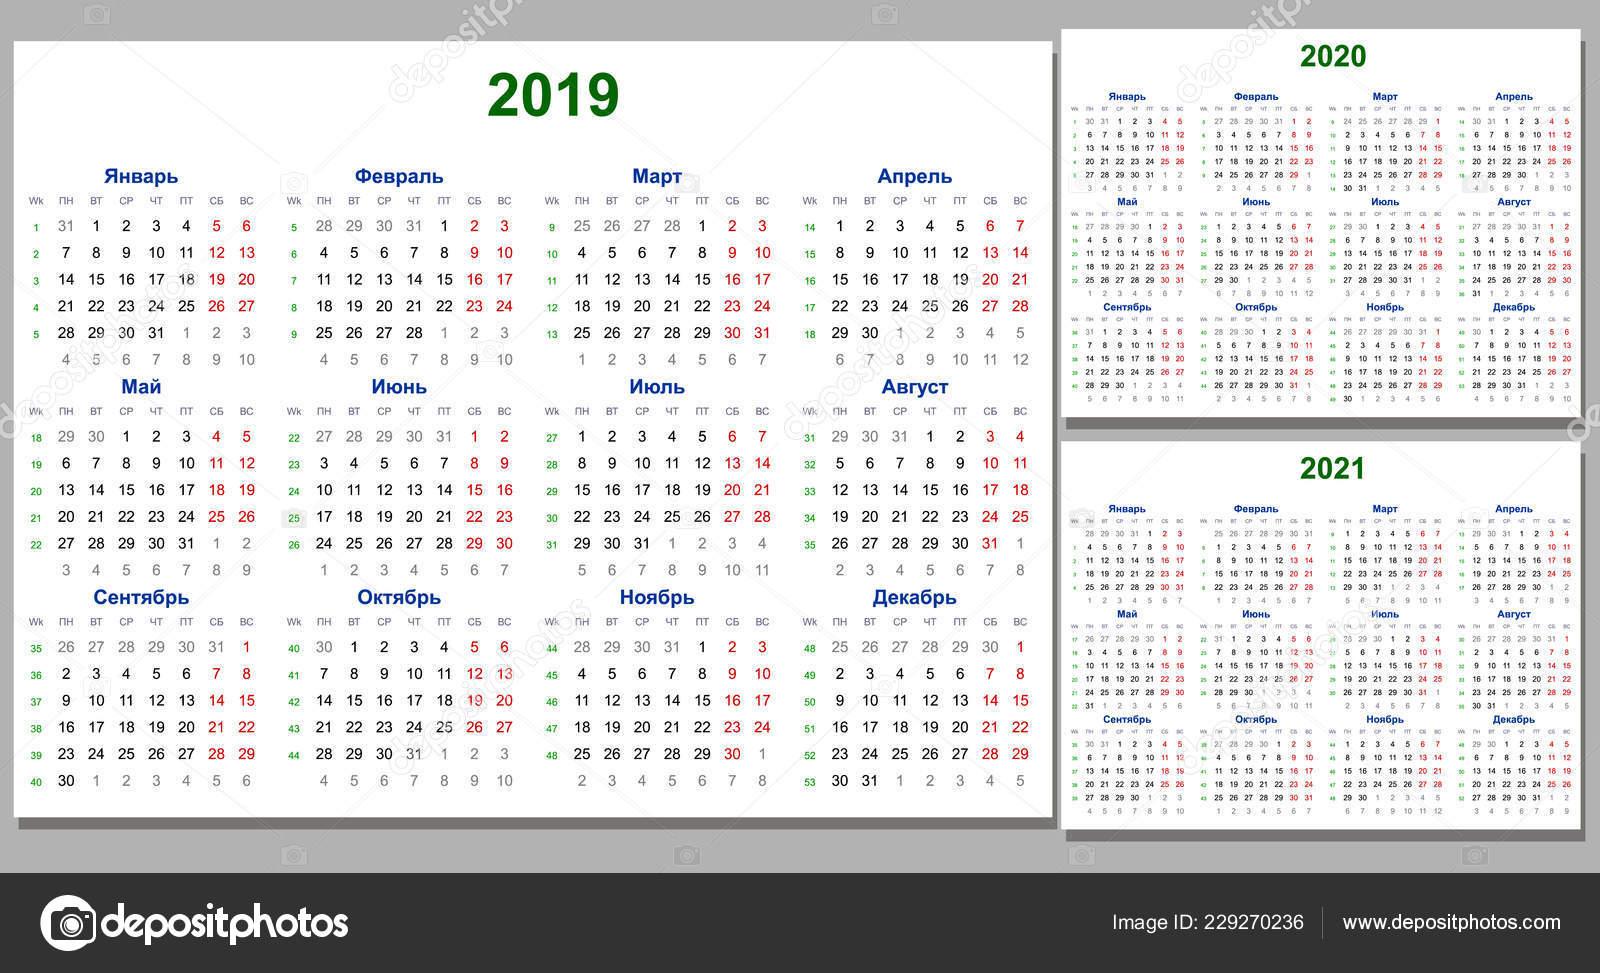 Imposta Calendario.Imposta Griglia Del Calendario Anni 2019 2020 2021 Semplice